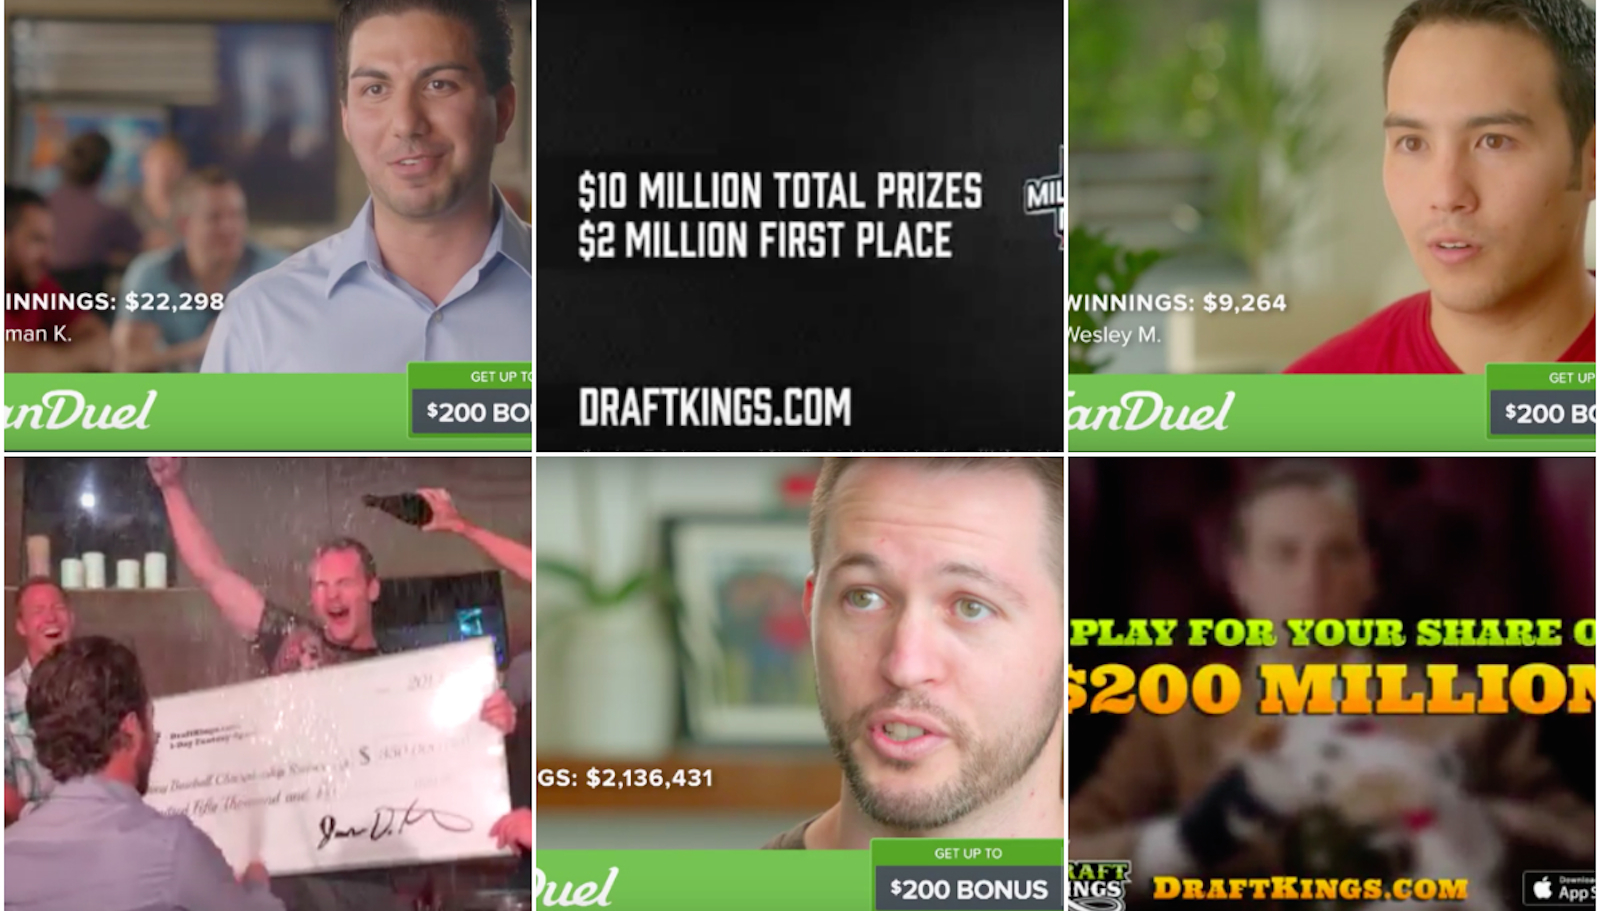 Big winnings, paid by bigger losers.